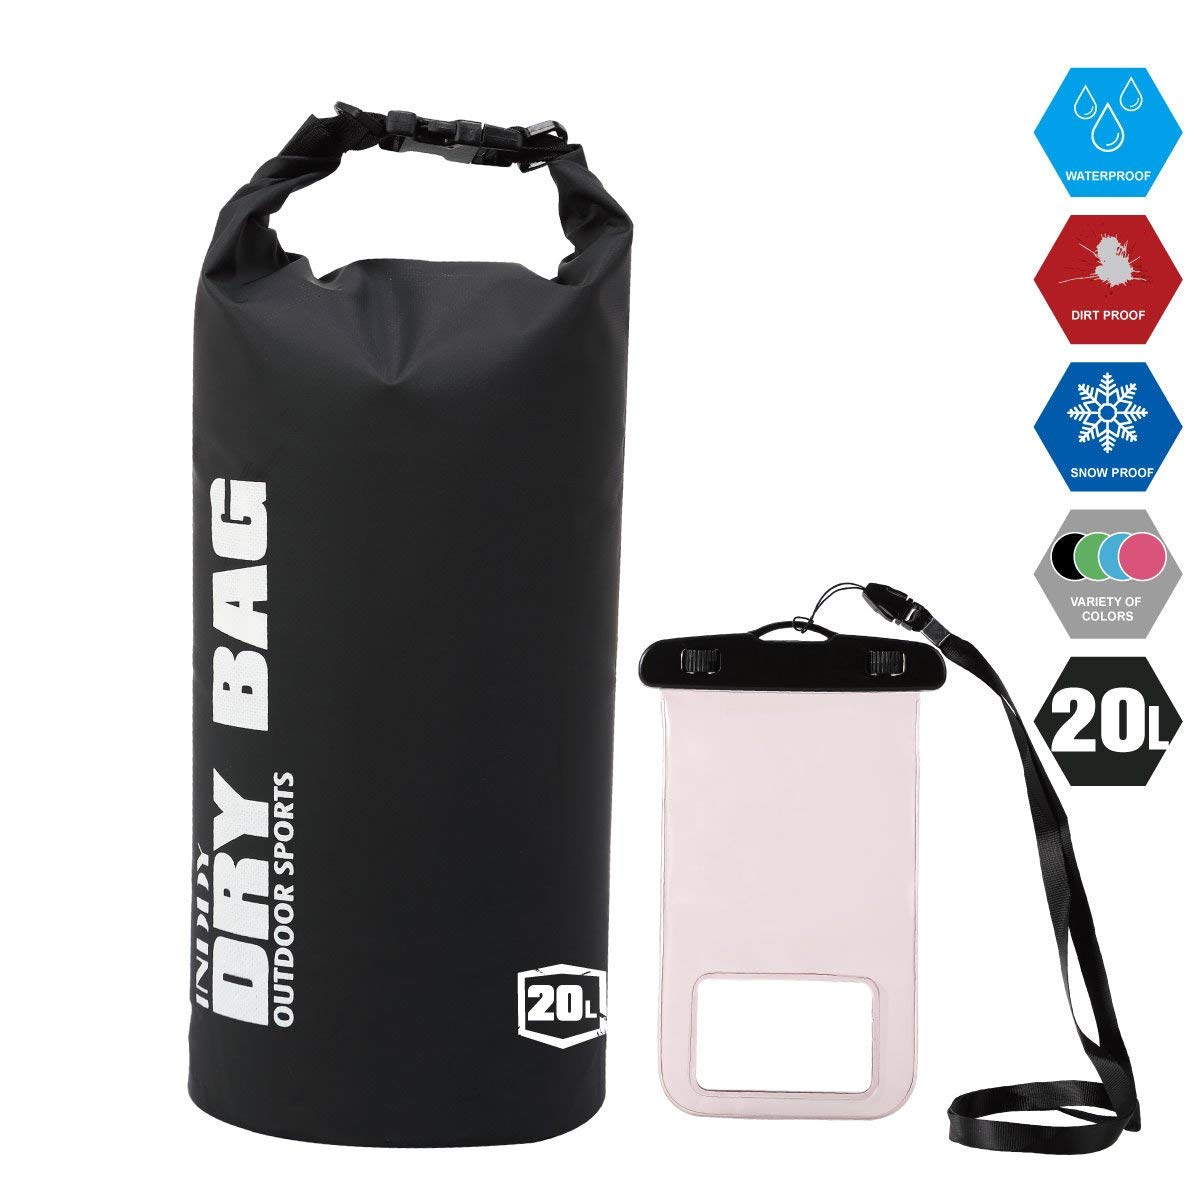 0cb6e6f8488c Get Quotations · Inddy Waterproof Dry Bag 5L 10L 20L 30L 40L Dry Gear Bag